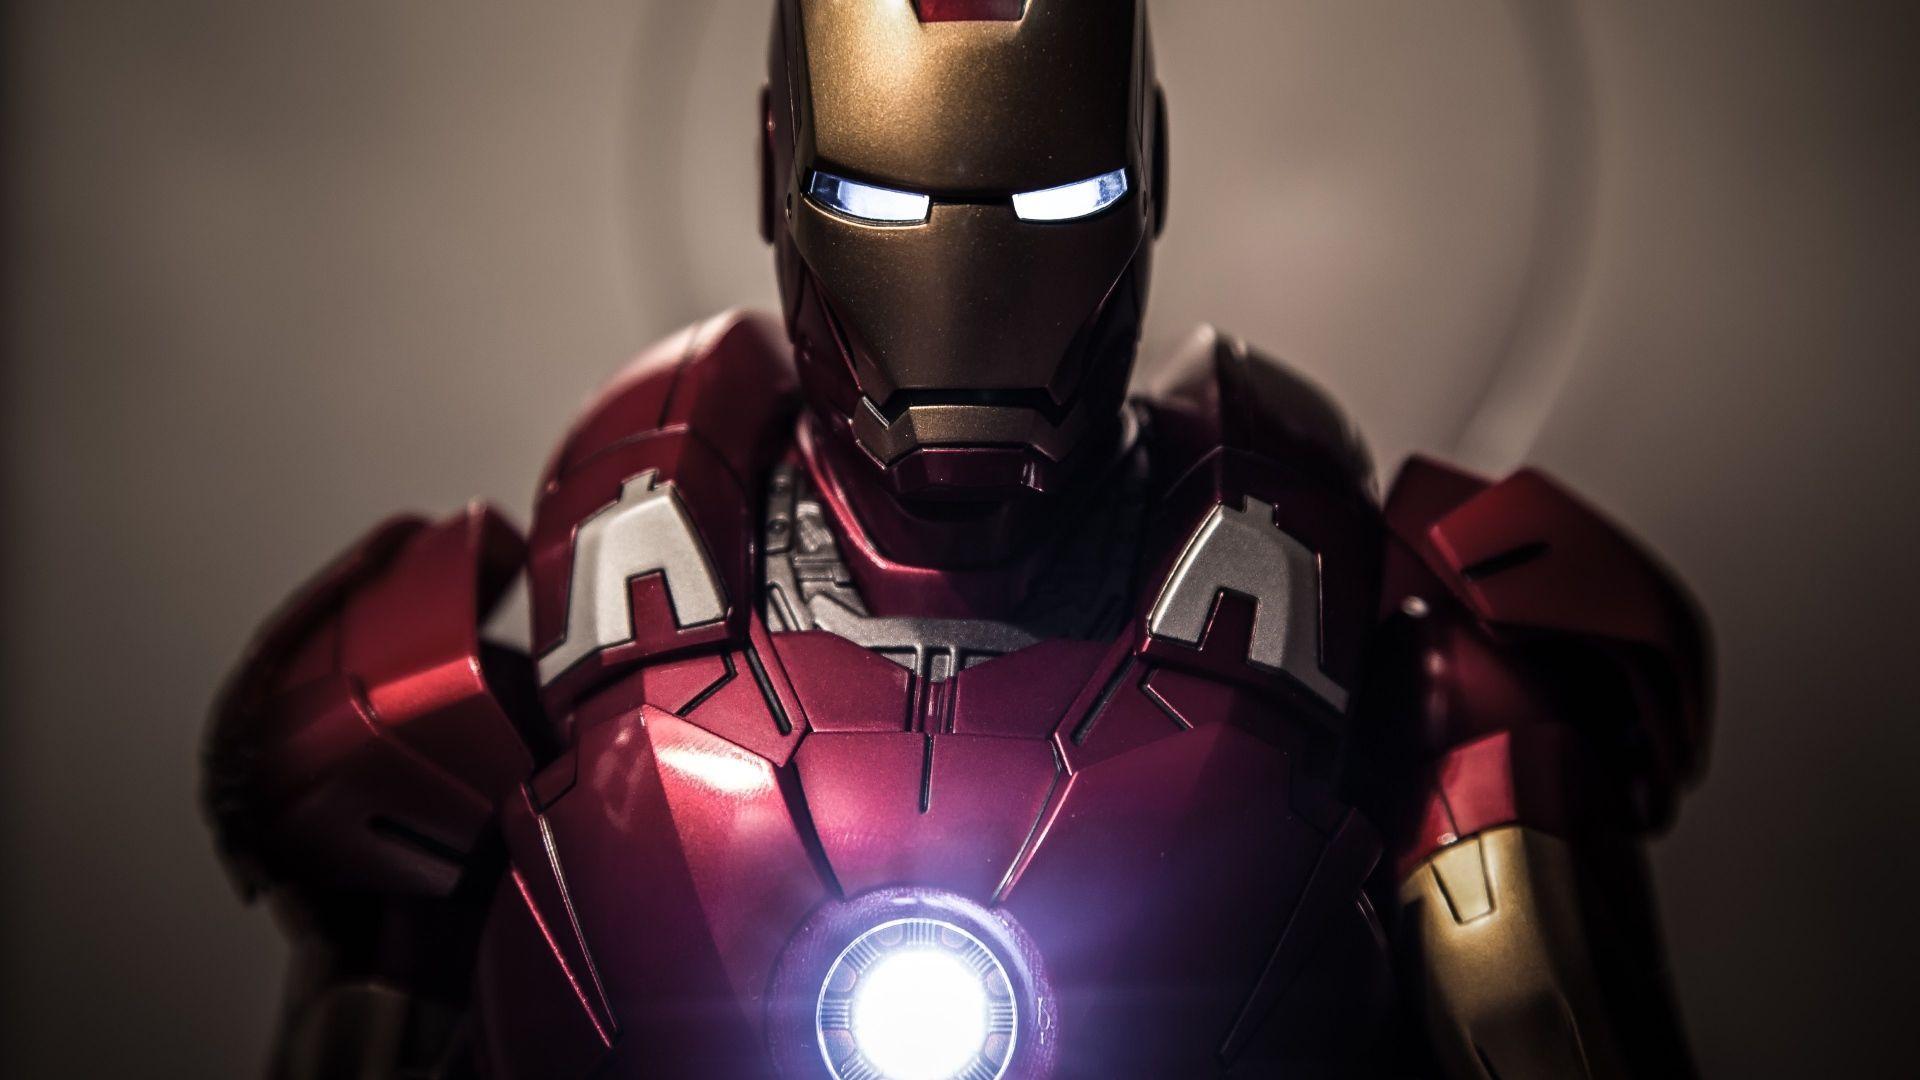 1920x1080 Wallpaper Iron Man Tony Stark Superhero Wallpaper